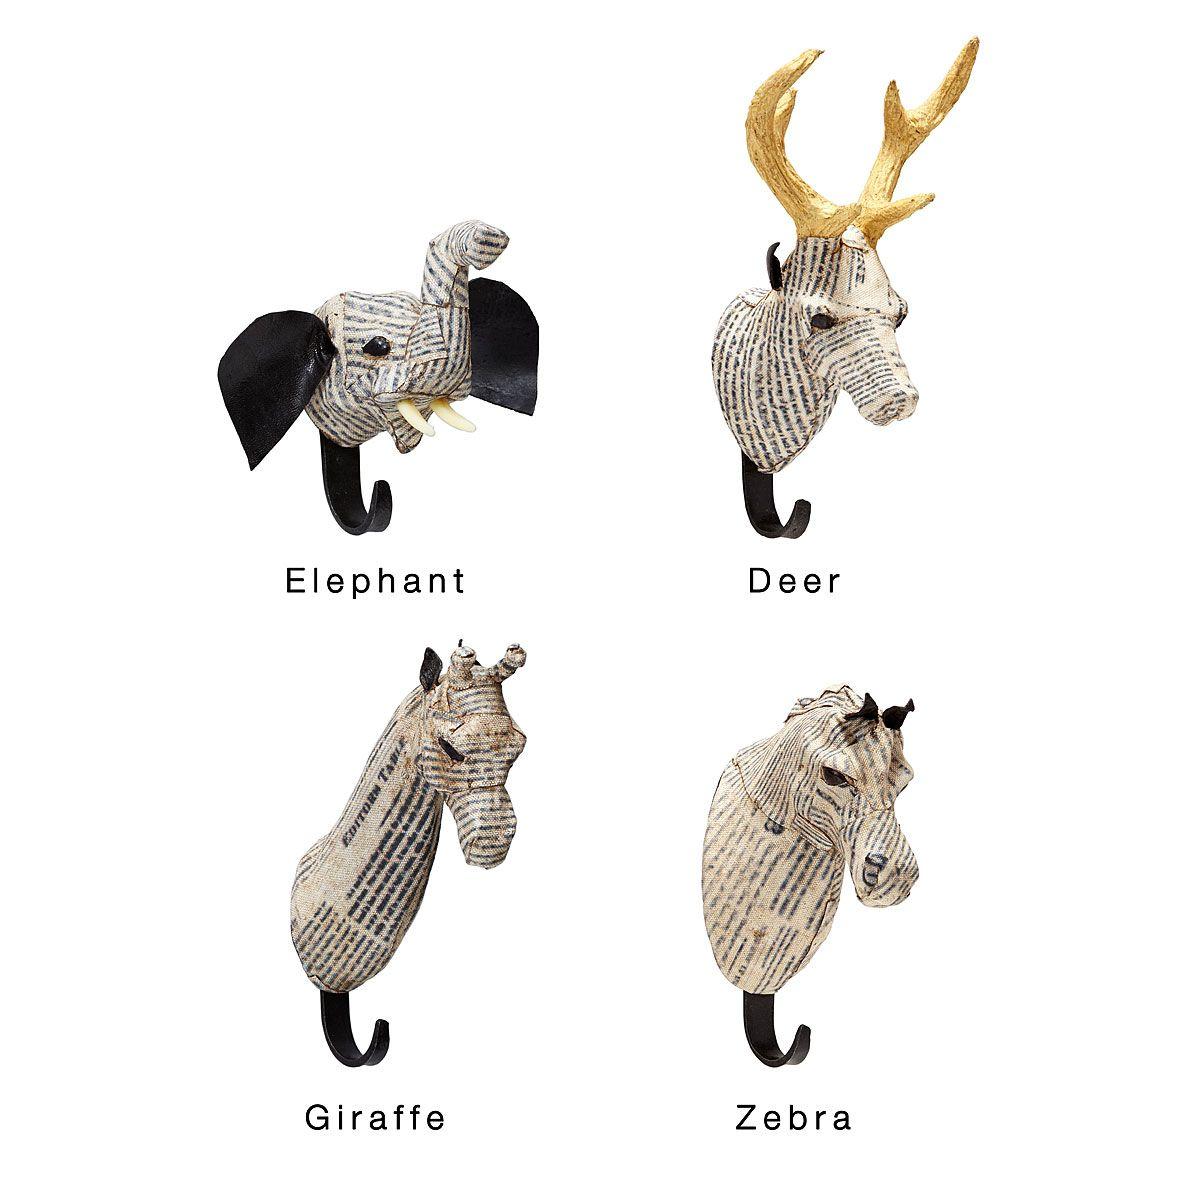 Paper Mache Animal Hooks Coat Hook Elephant Giraffe Uncommongoods Paper Mache Animals Animal Hooks Paper Mache